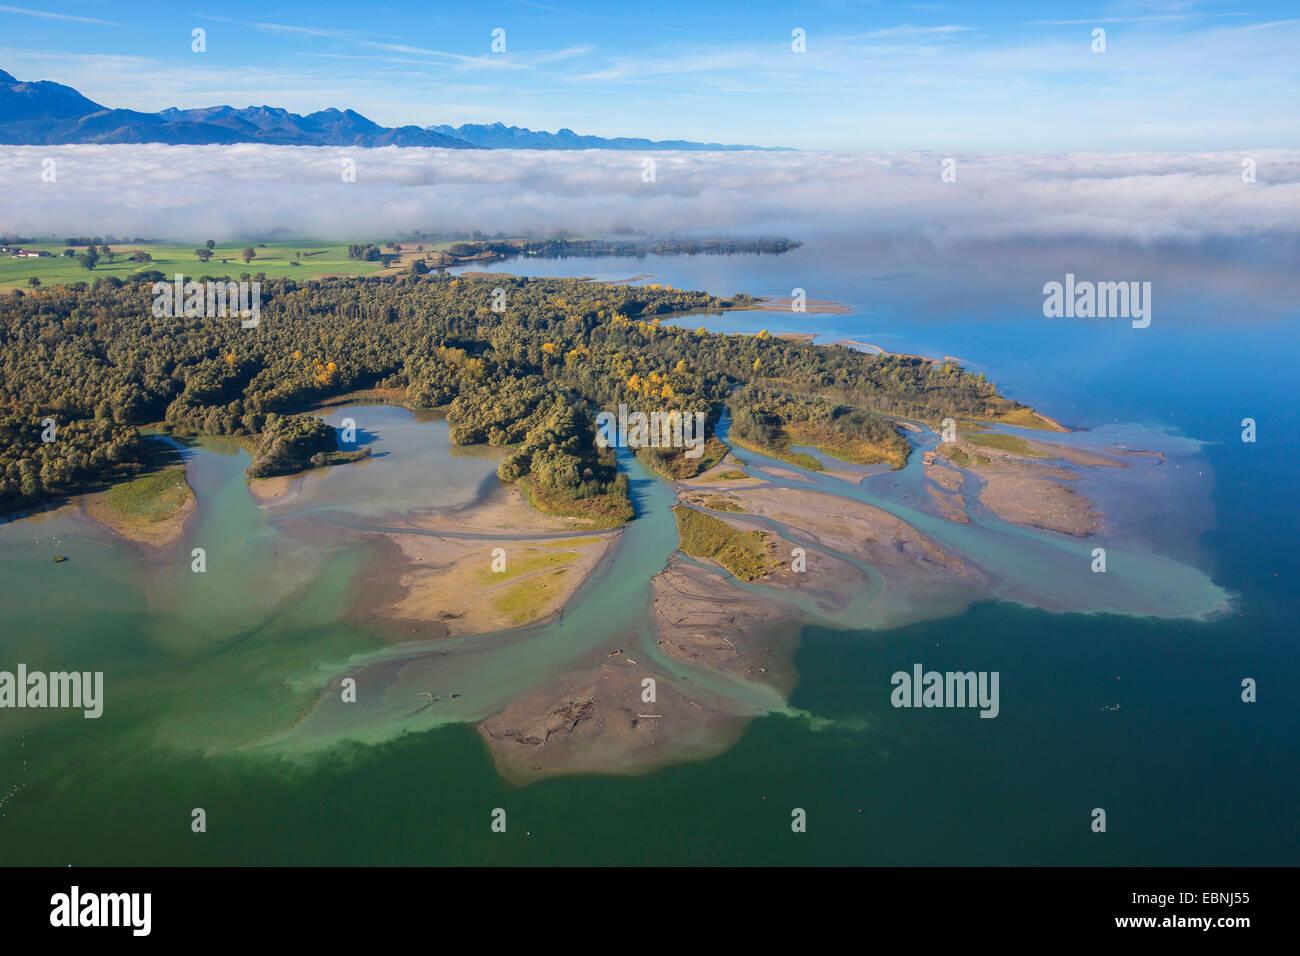 Chiemsee and Tiroler Achen river delta, Germany, Bavaria, Lake Chiemsee Stock Photo